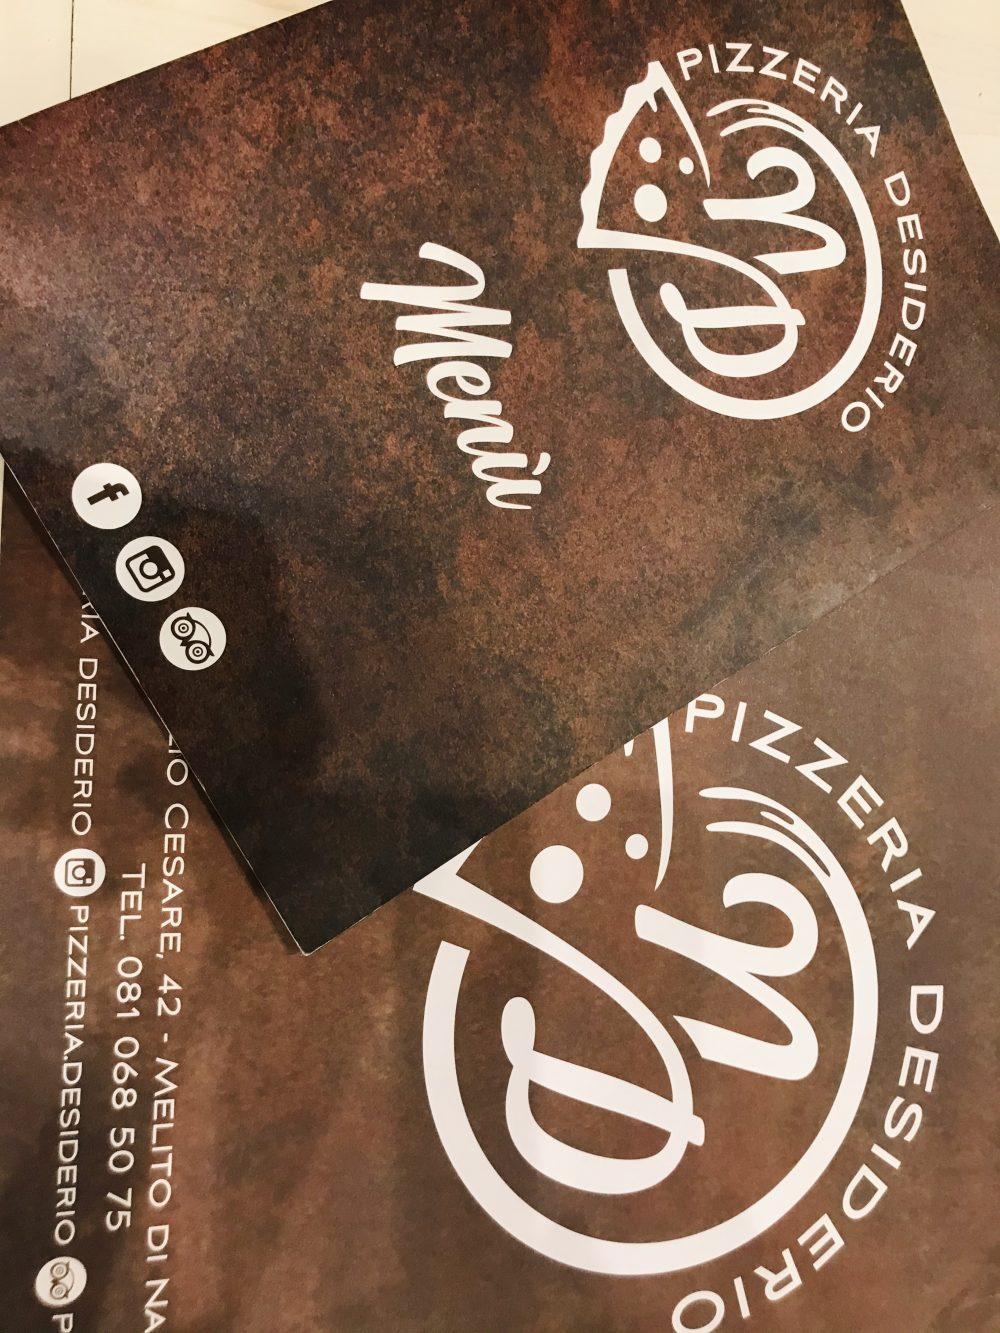 Pizzeria Desiderio - menu'